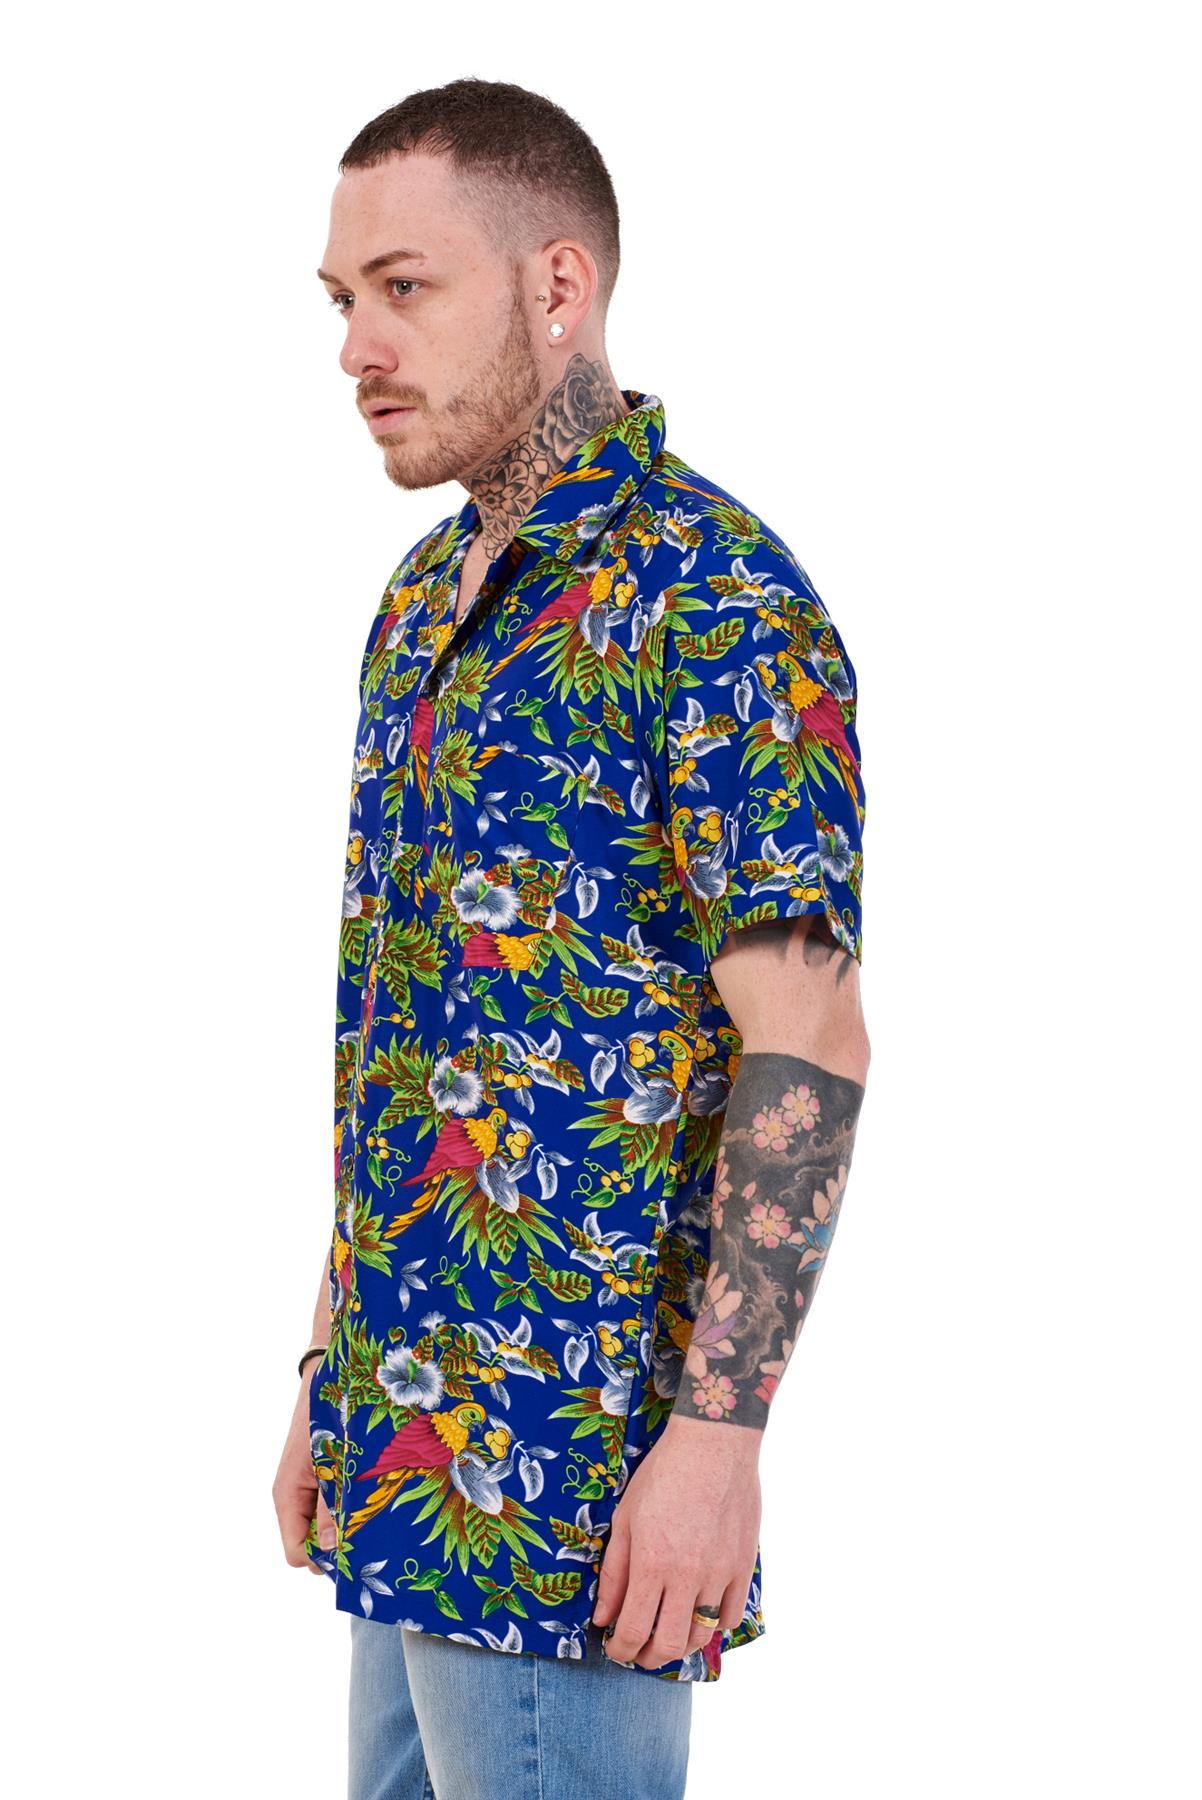 Mens-Hawaiian-Shirt-Multi-Colors-Print-Regular-Big-Size-Summer-Fancy-Dress-M-5XL thumbnail 18